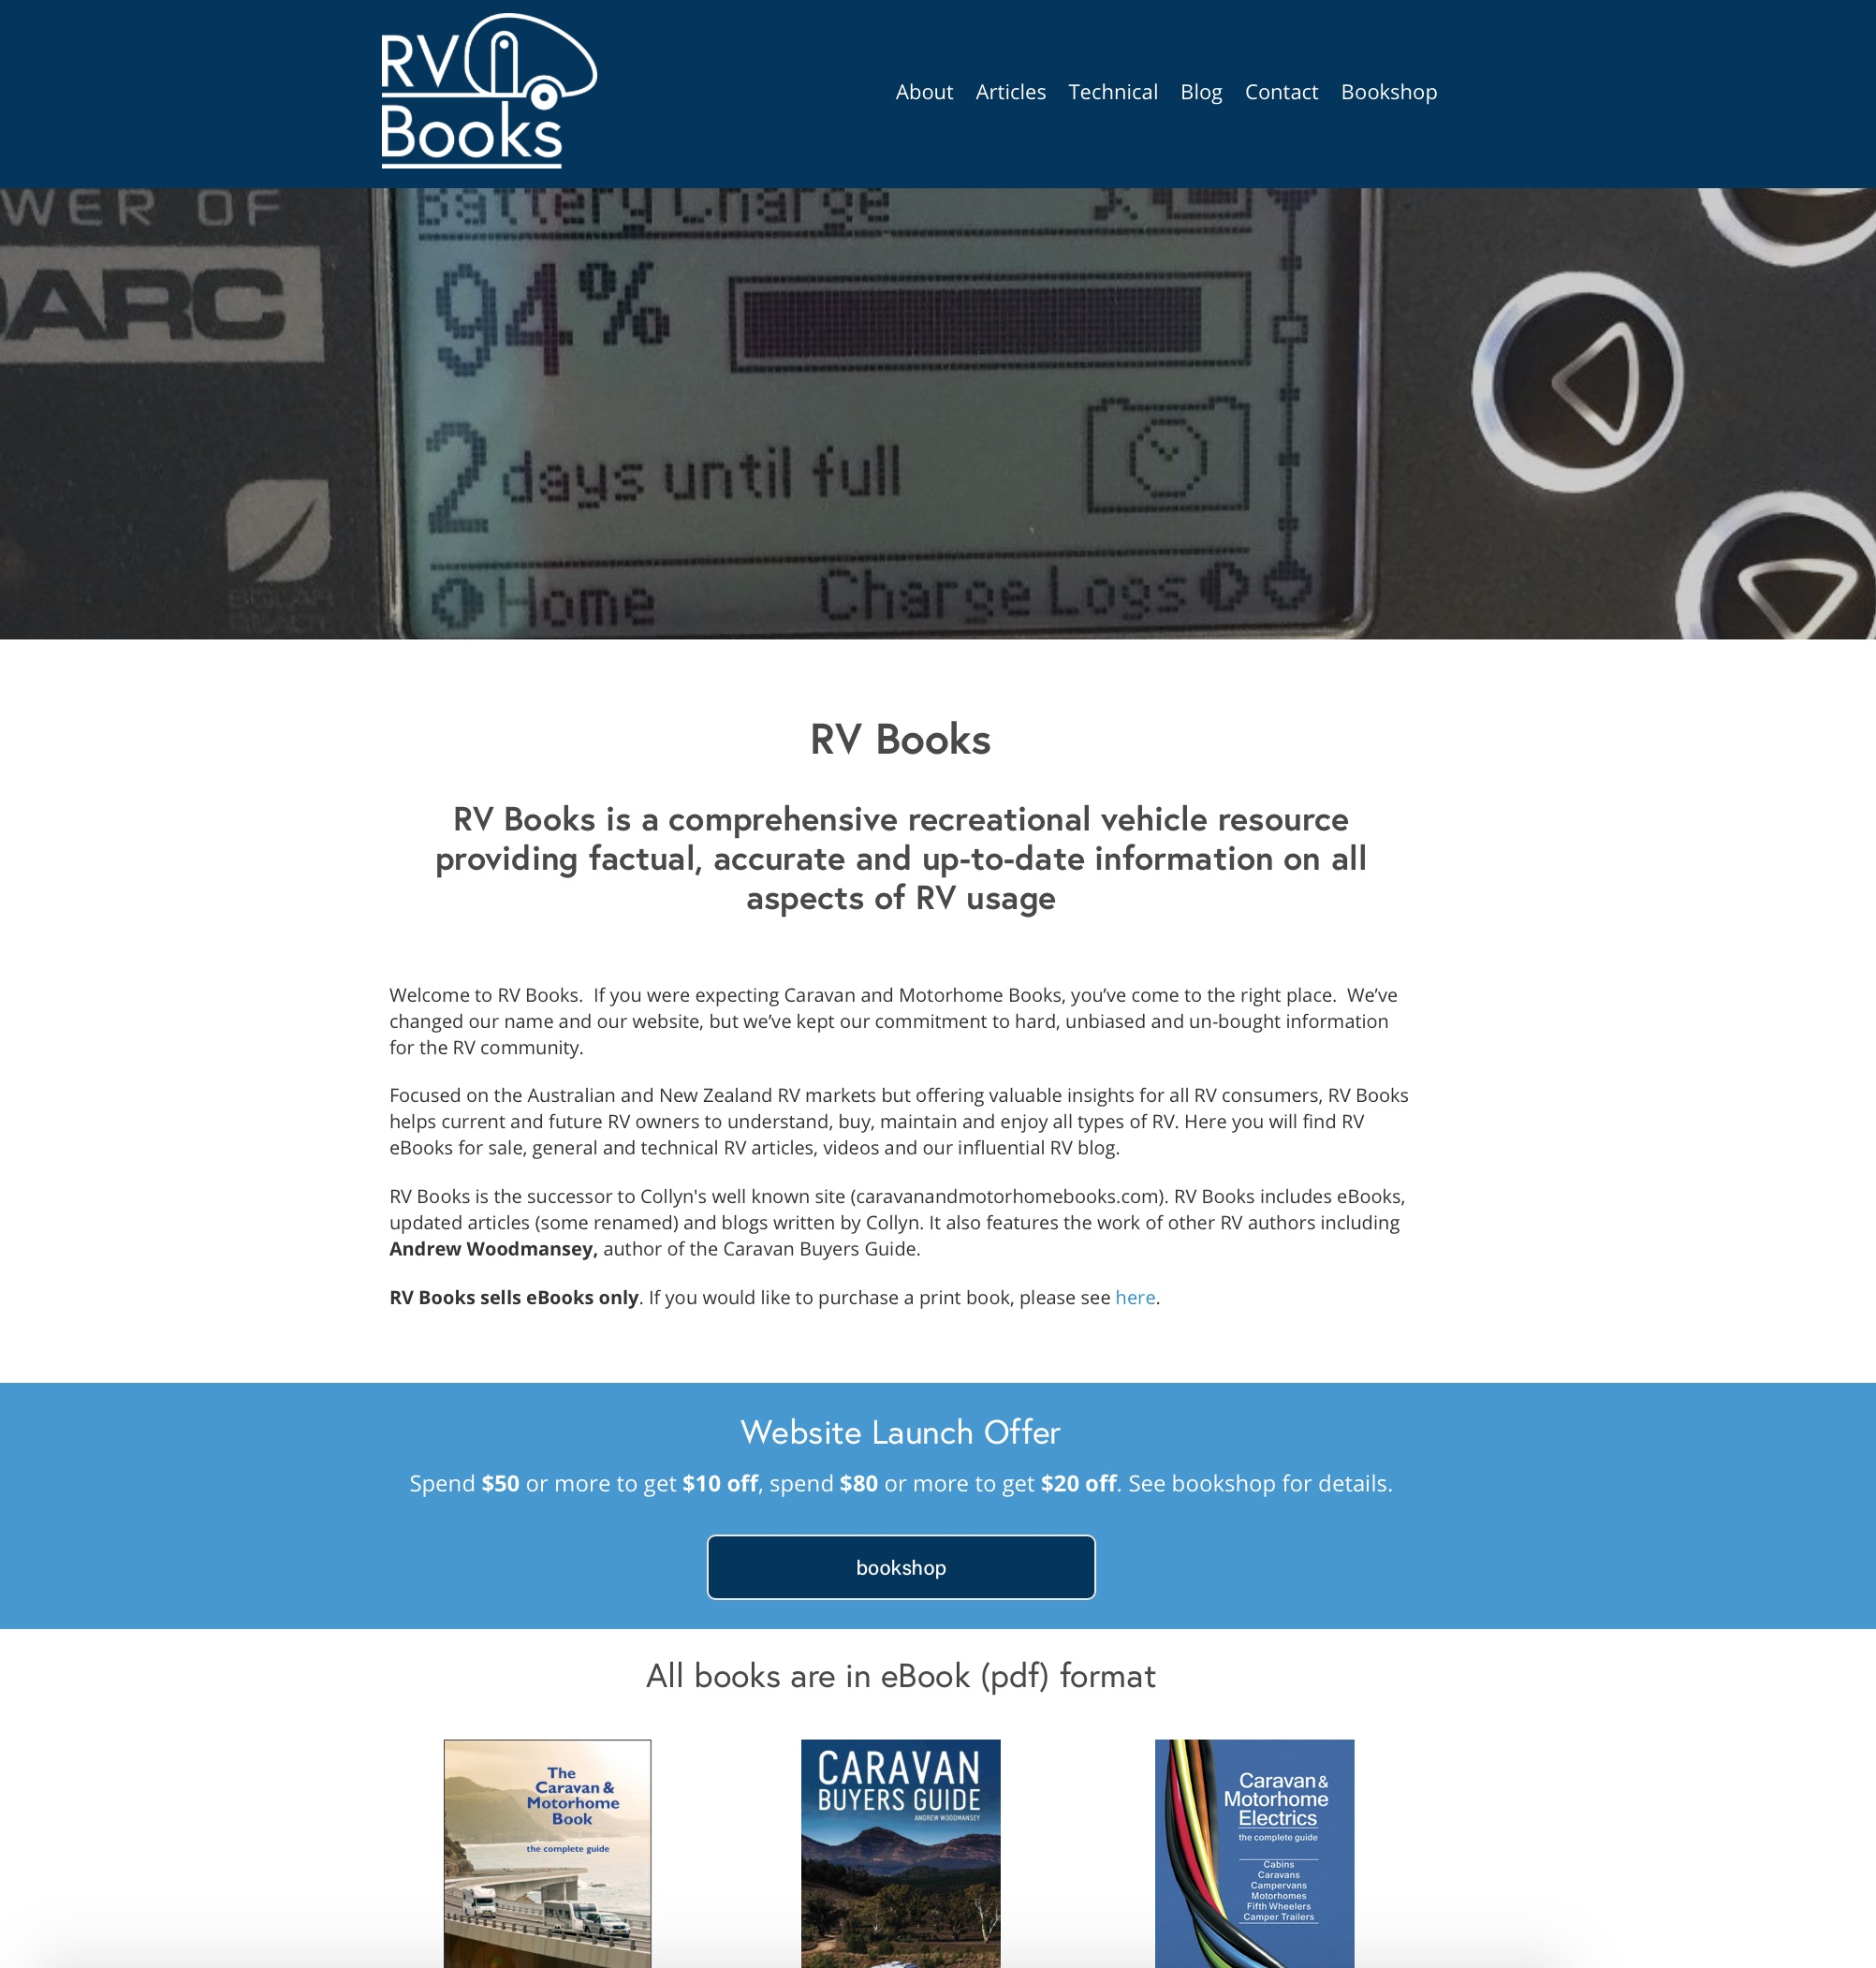 RVBooks